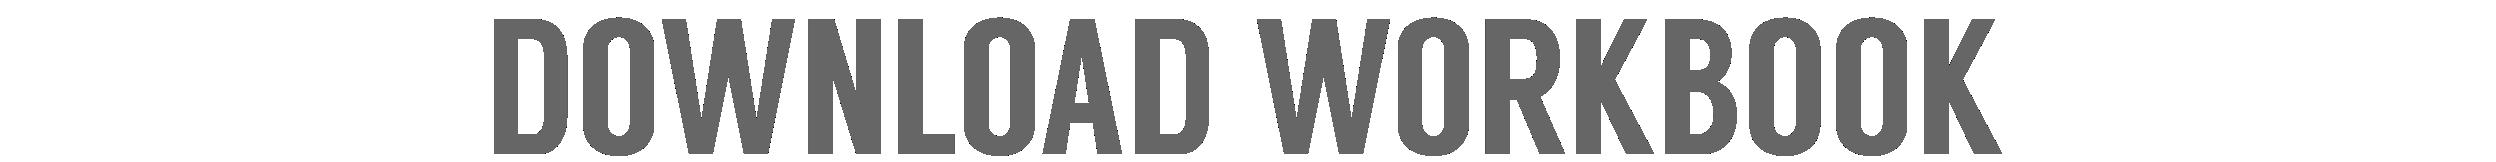 DownloadWorkbookSample.png